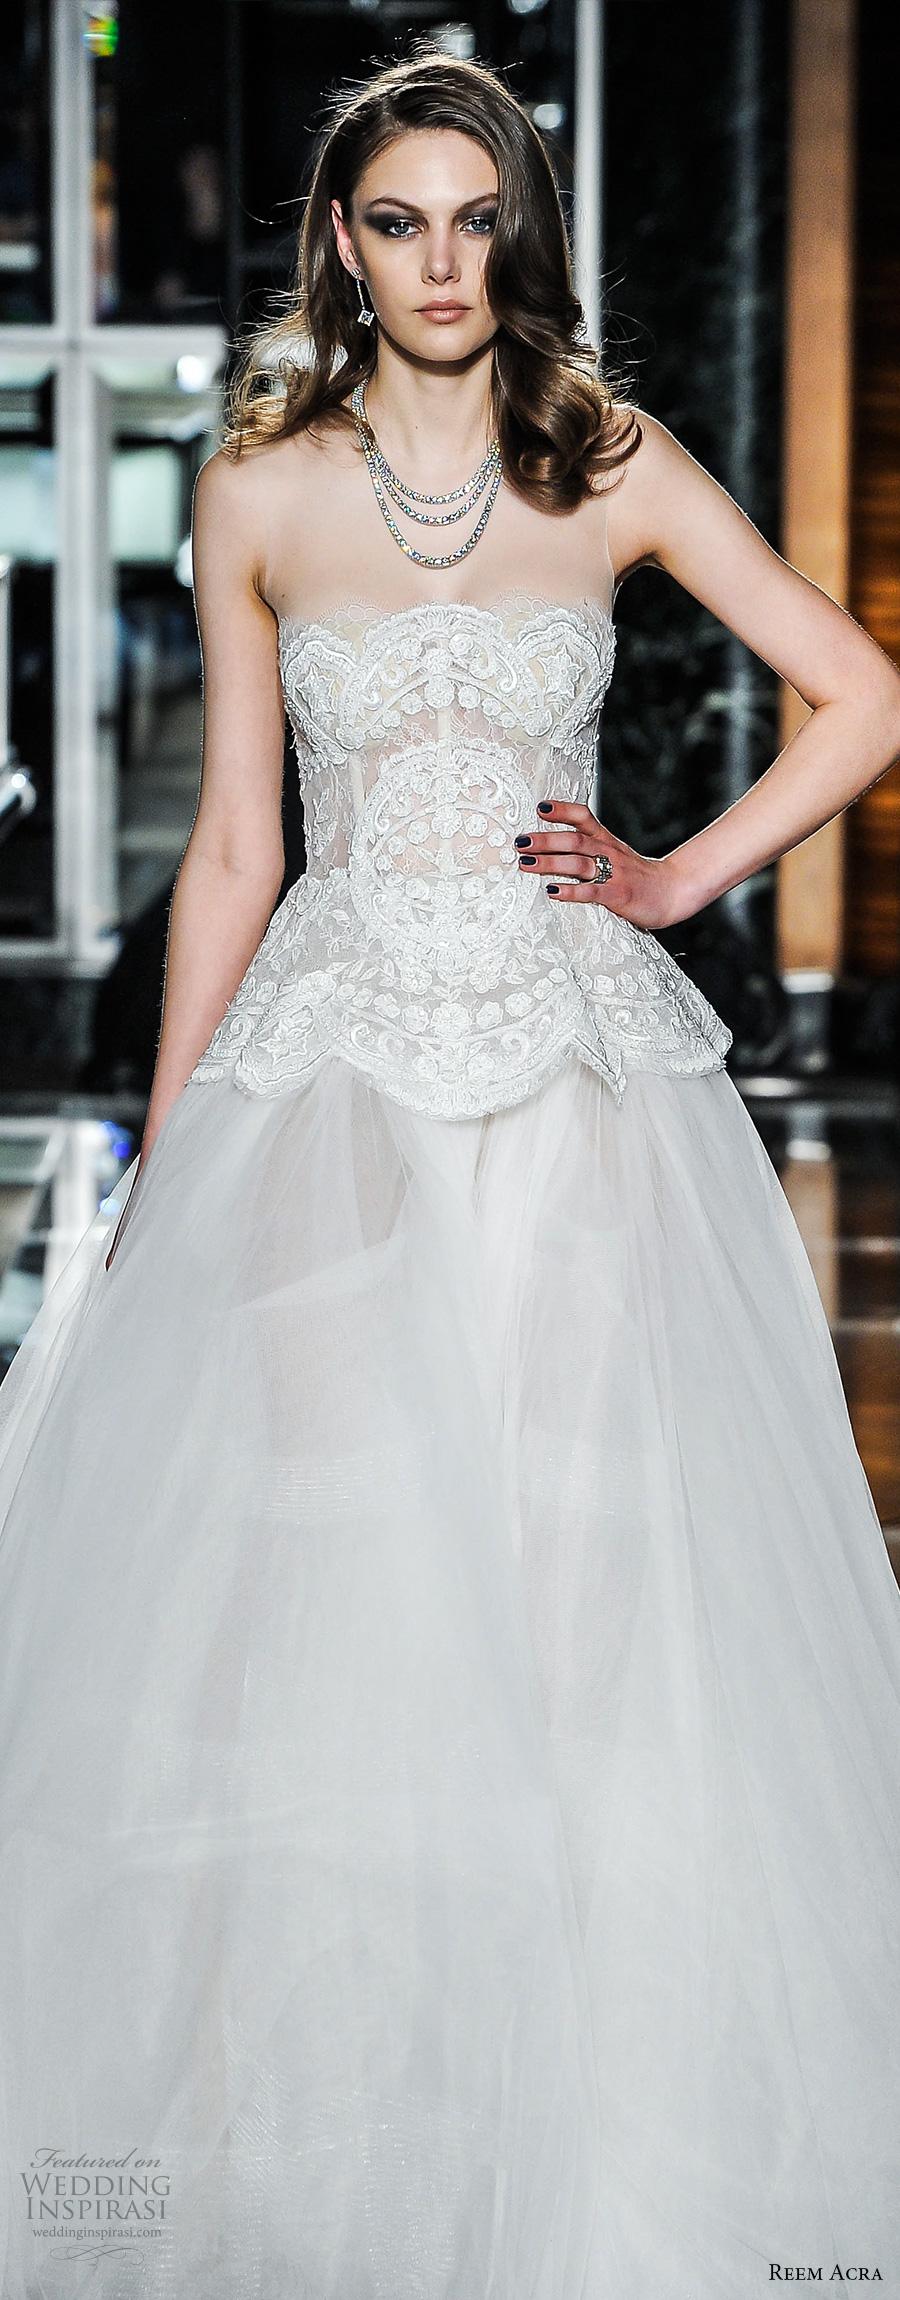 Reem Acra Wedding Gown 24 Best reem acra spring bridal